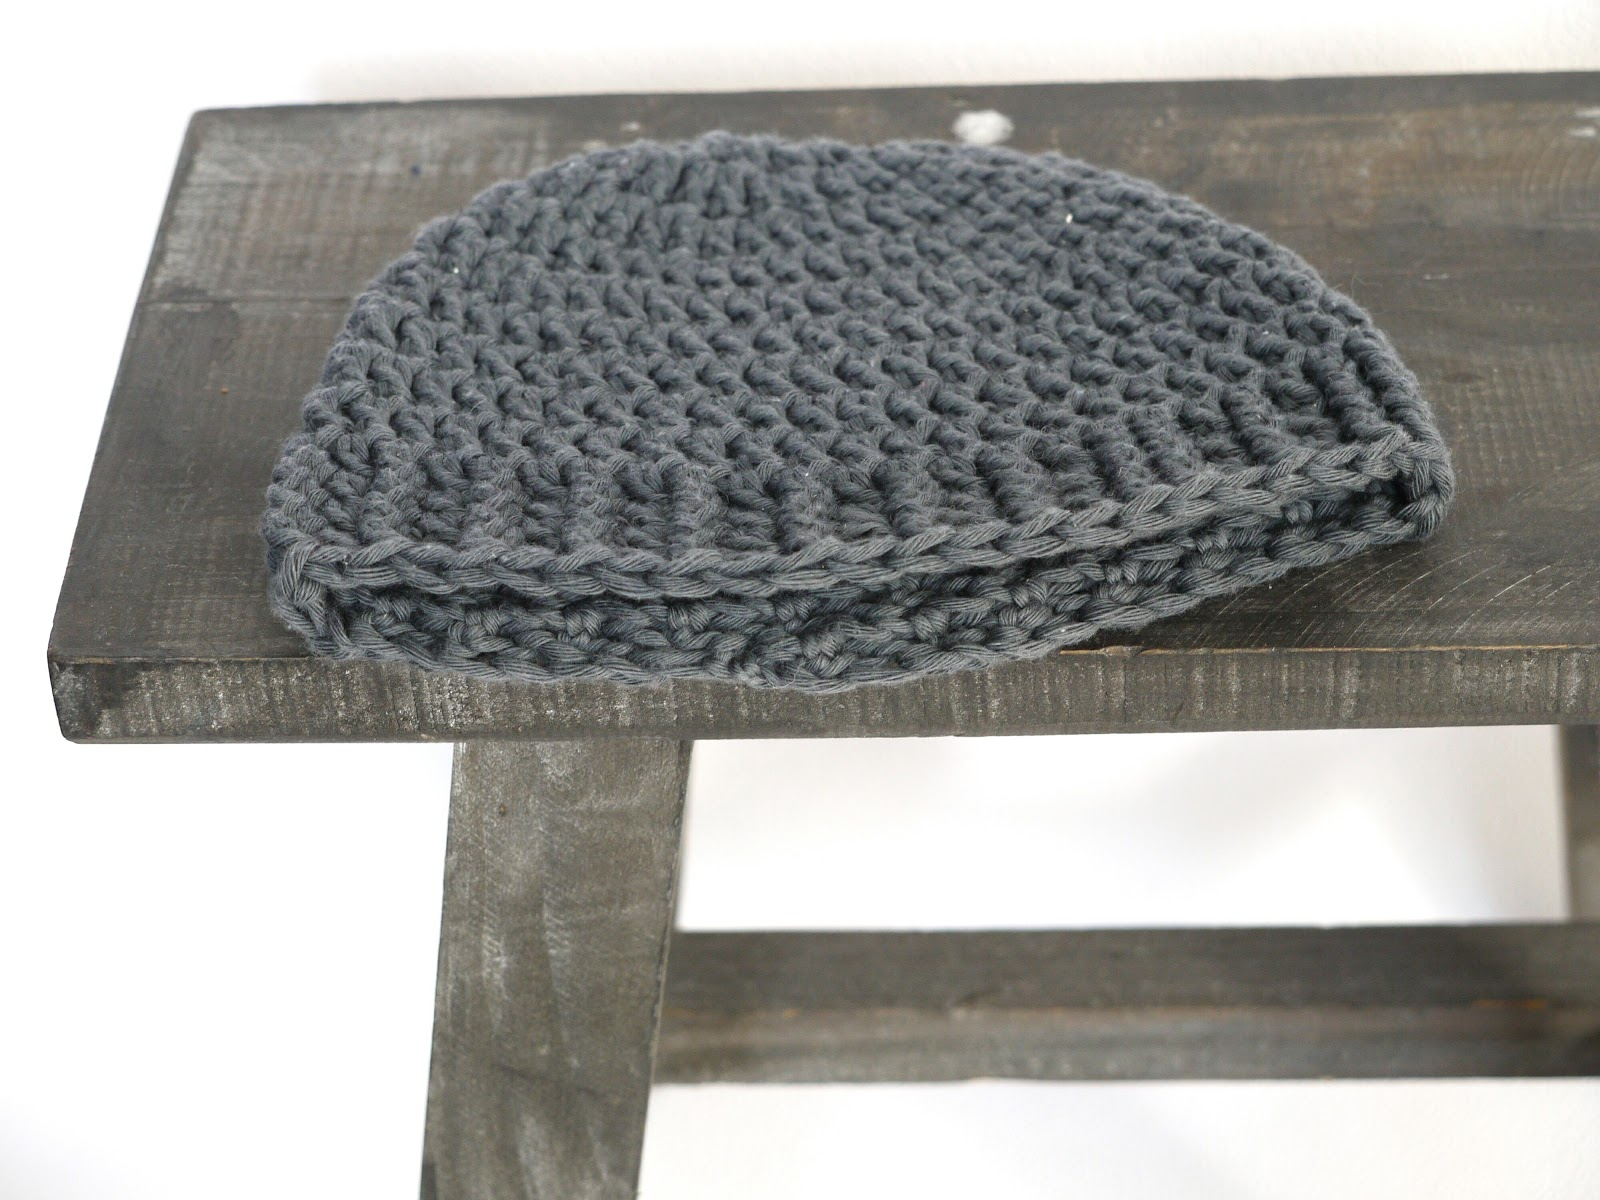 079e5000f5b Crocheted Baby Beanie with pattern - Zusje Knus